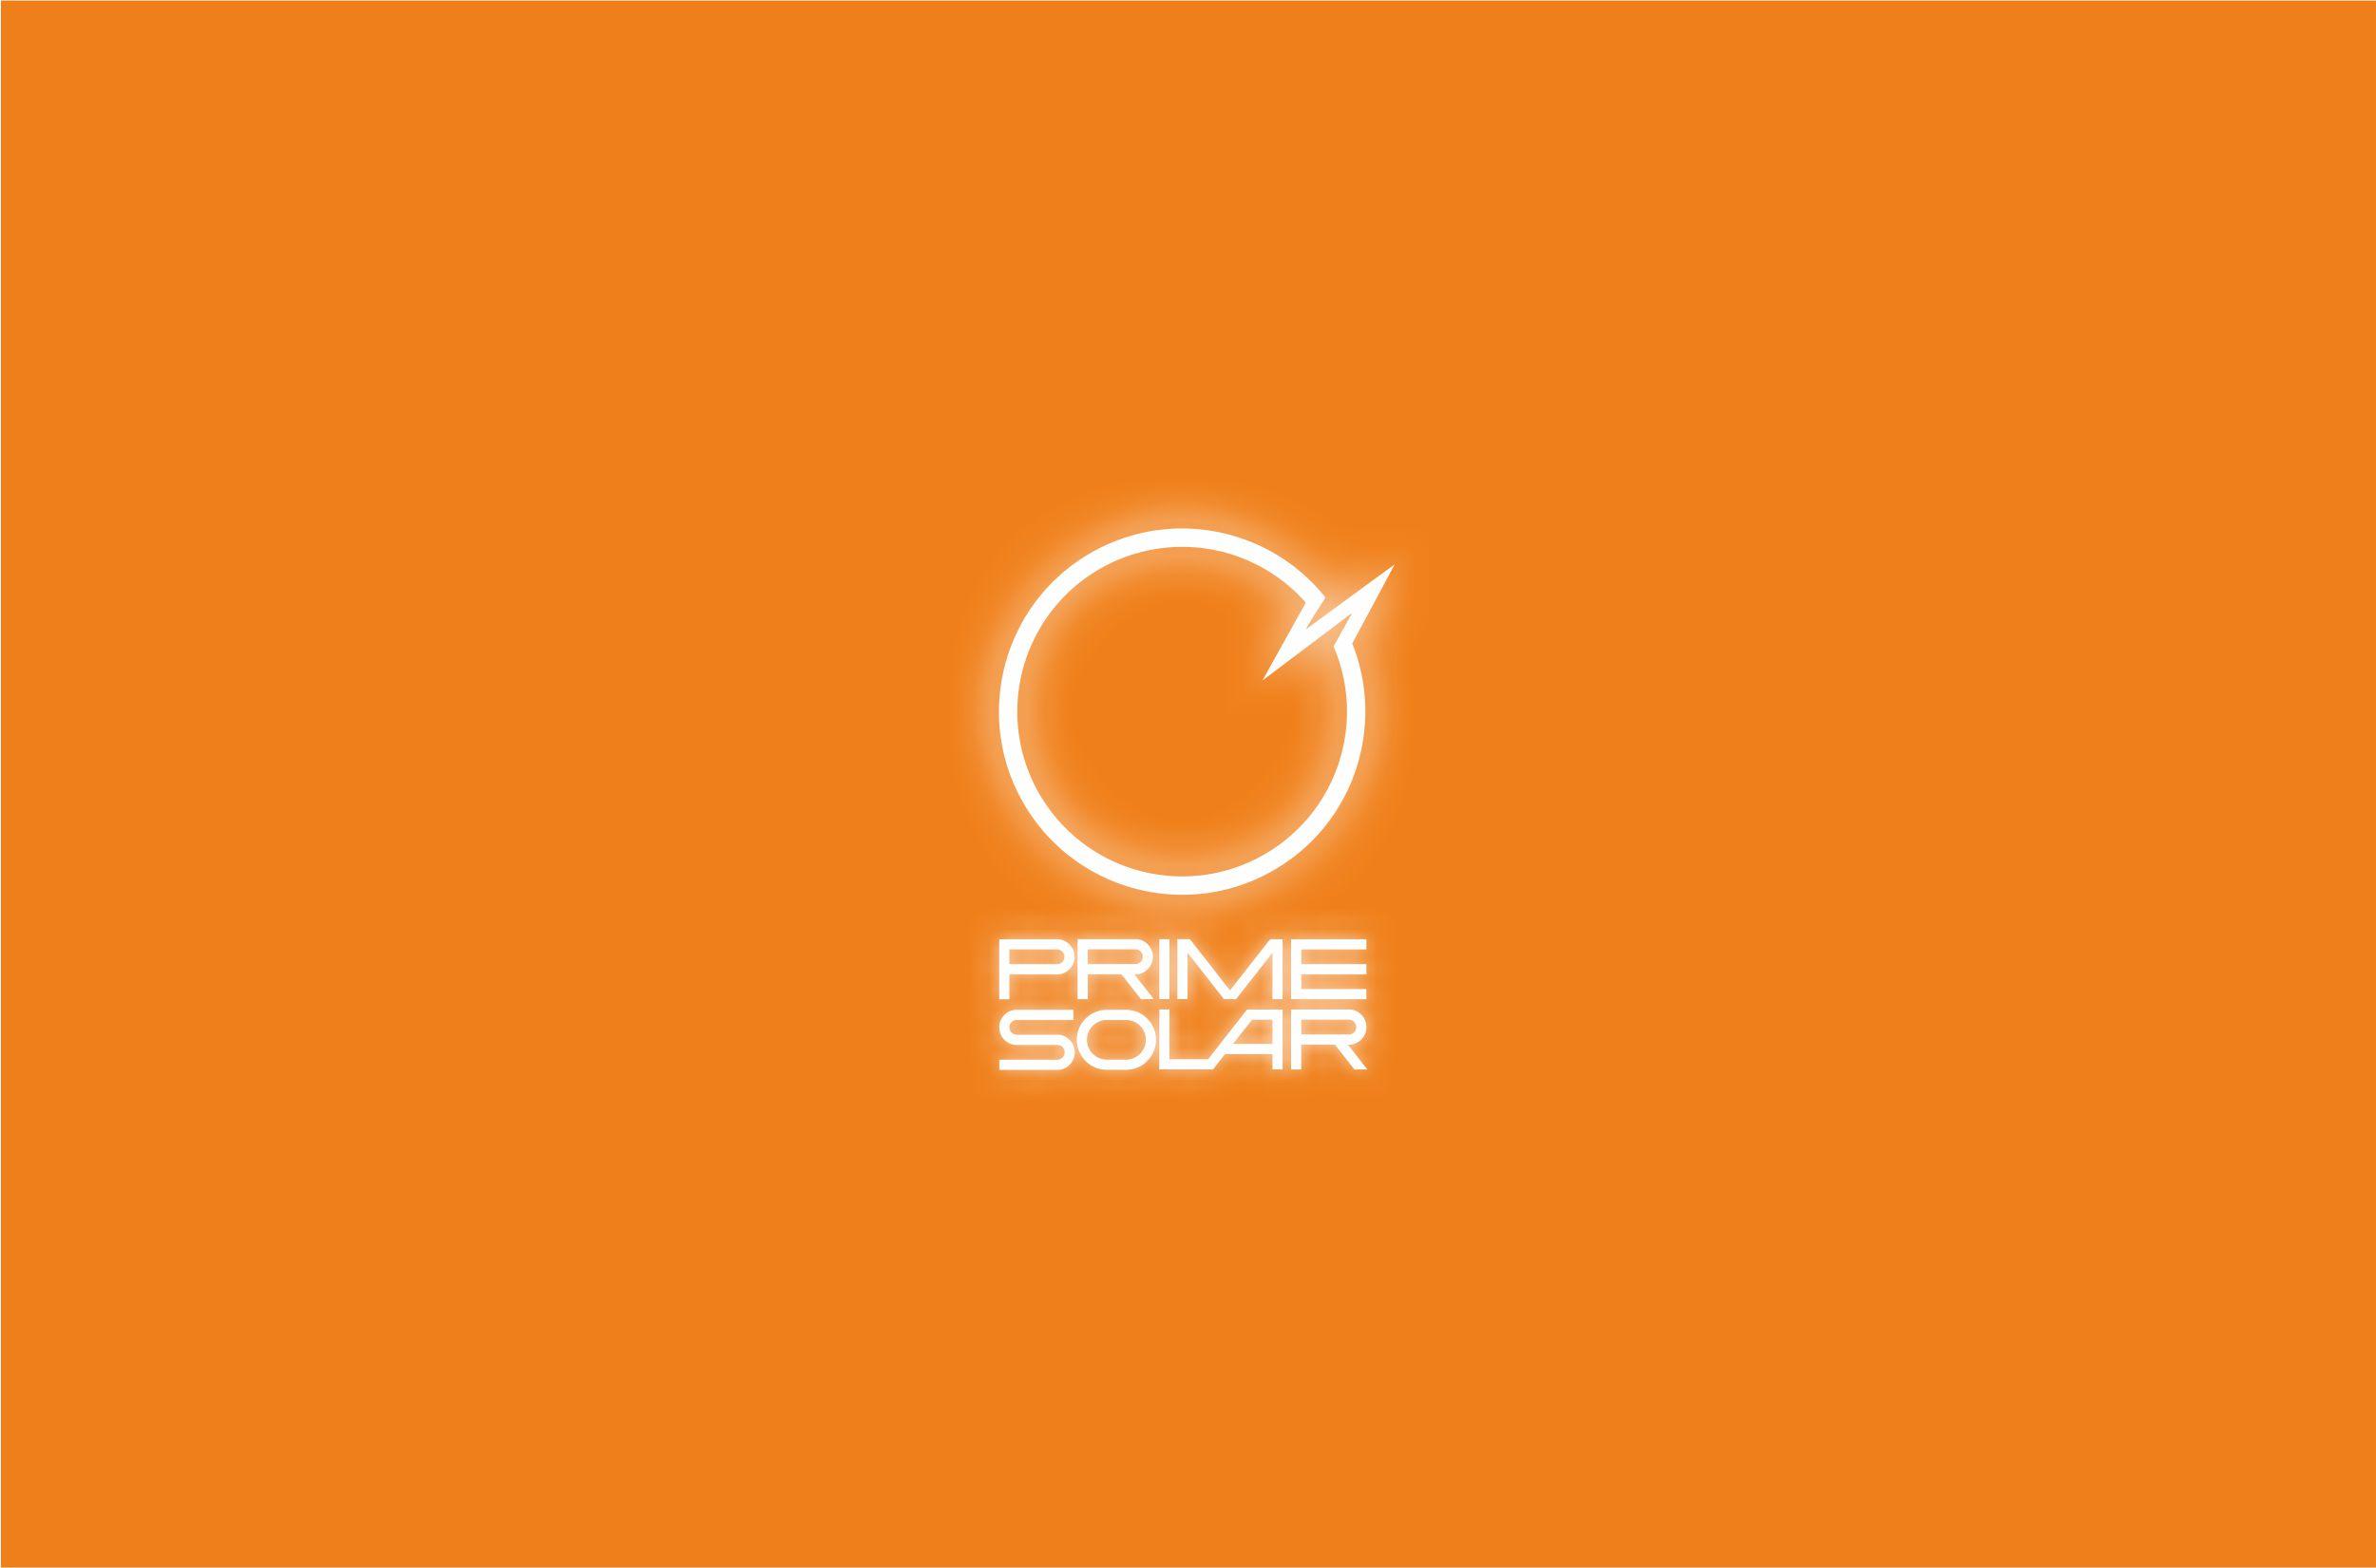 Логотип компании PrimeSolar [UPD: 16:45 15/12/11] фото f_4ef2768b8e5e1.jpg